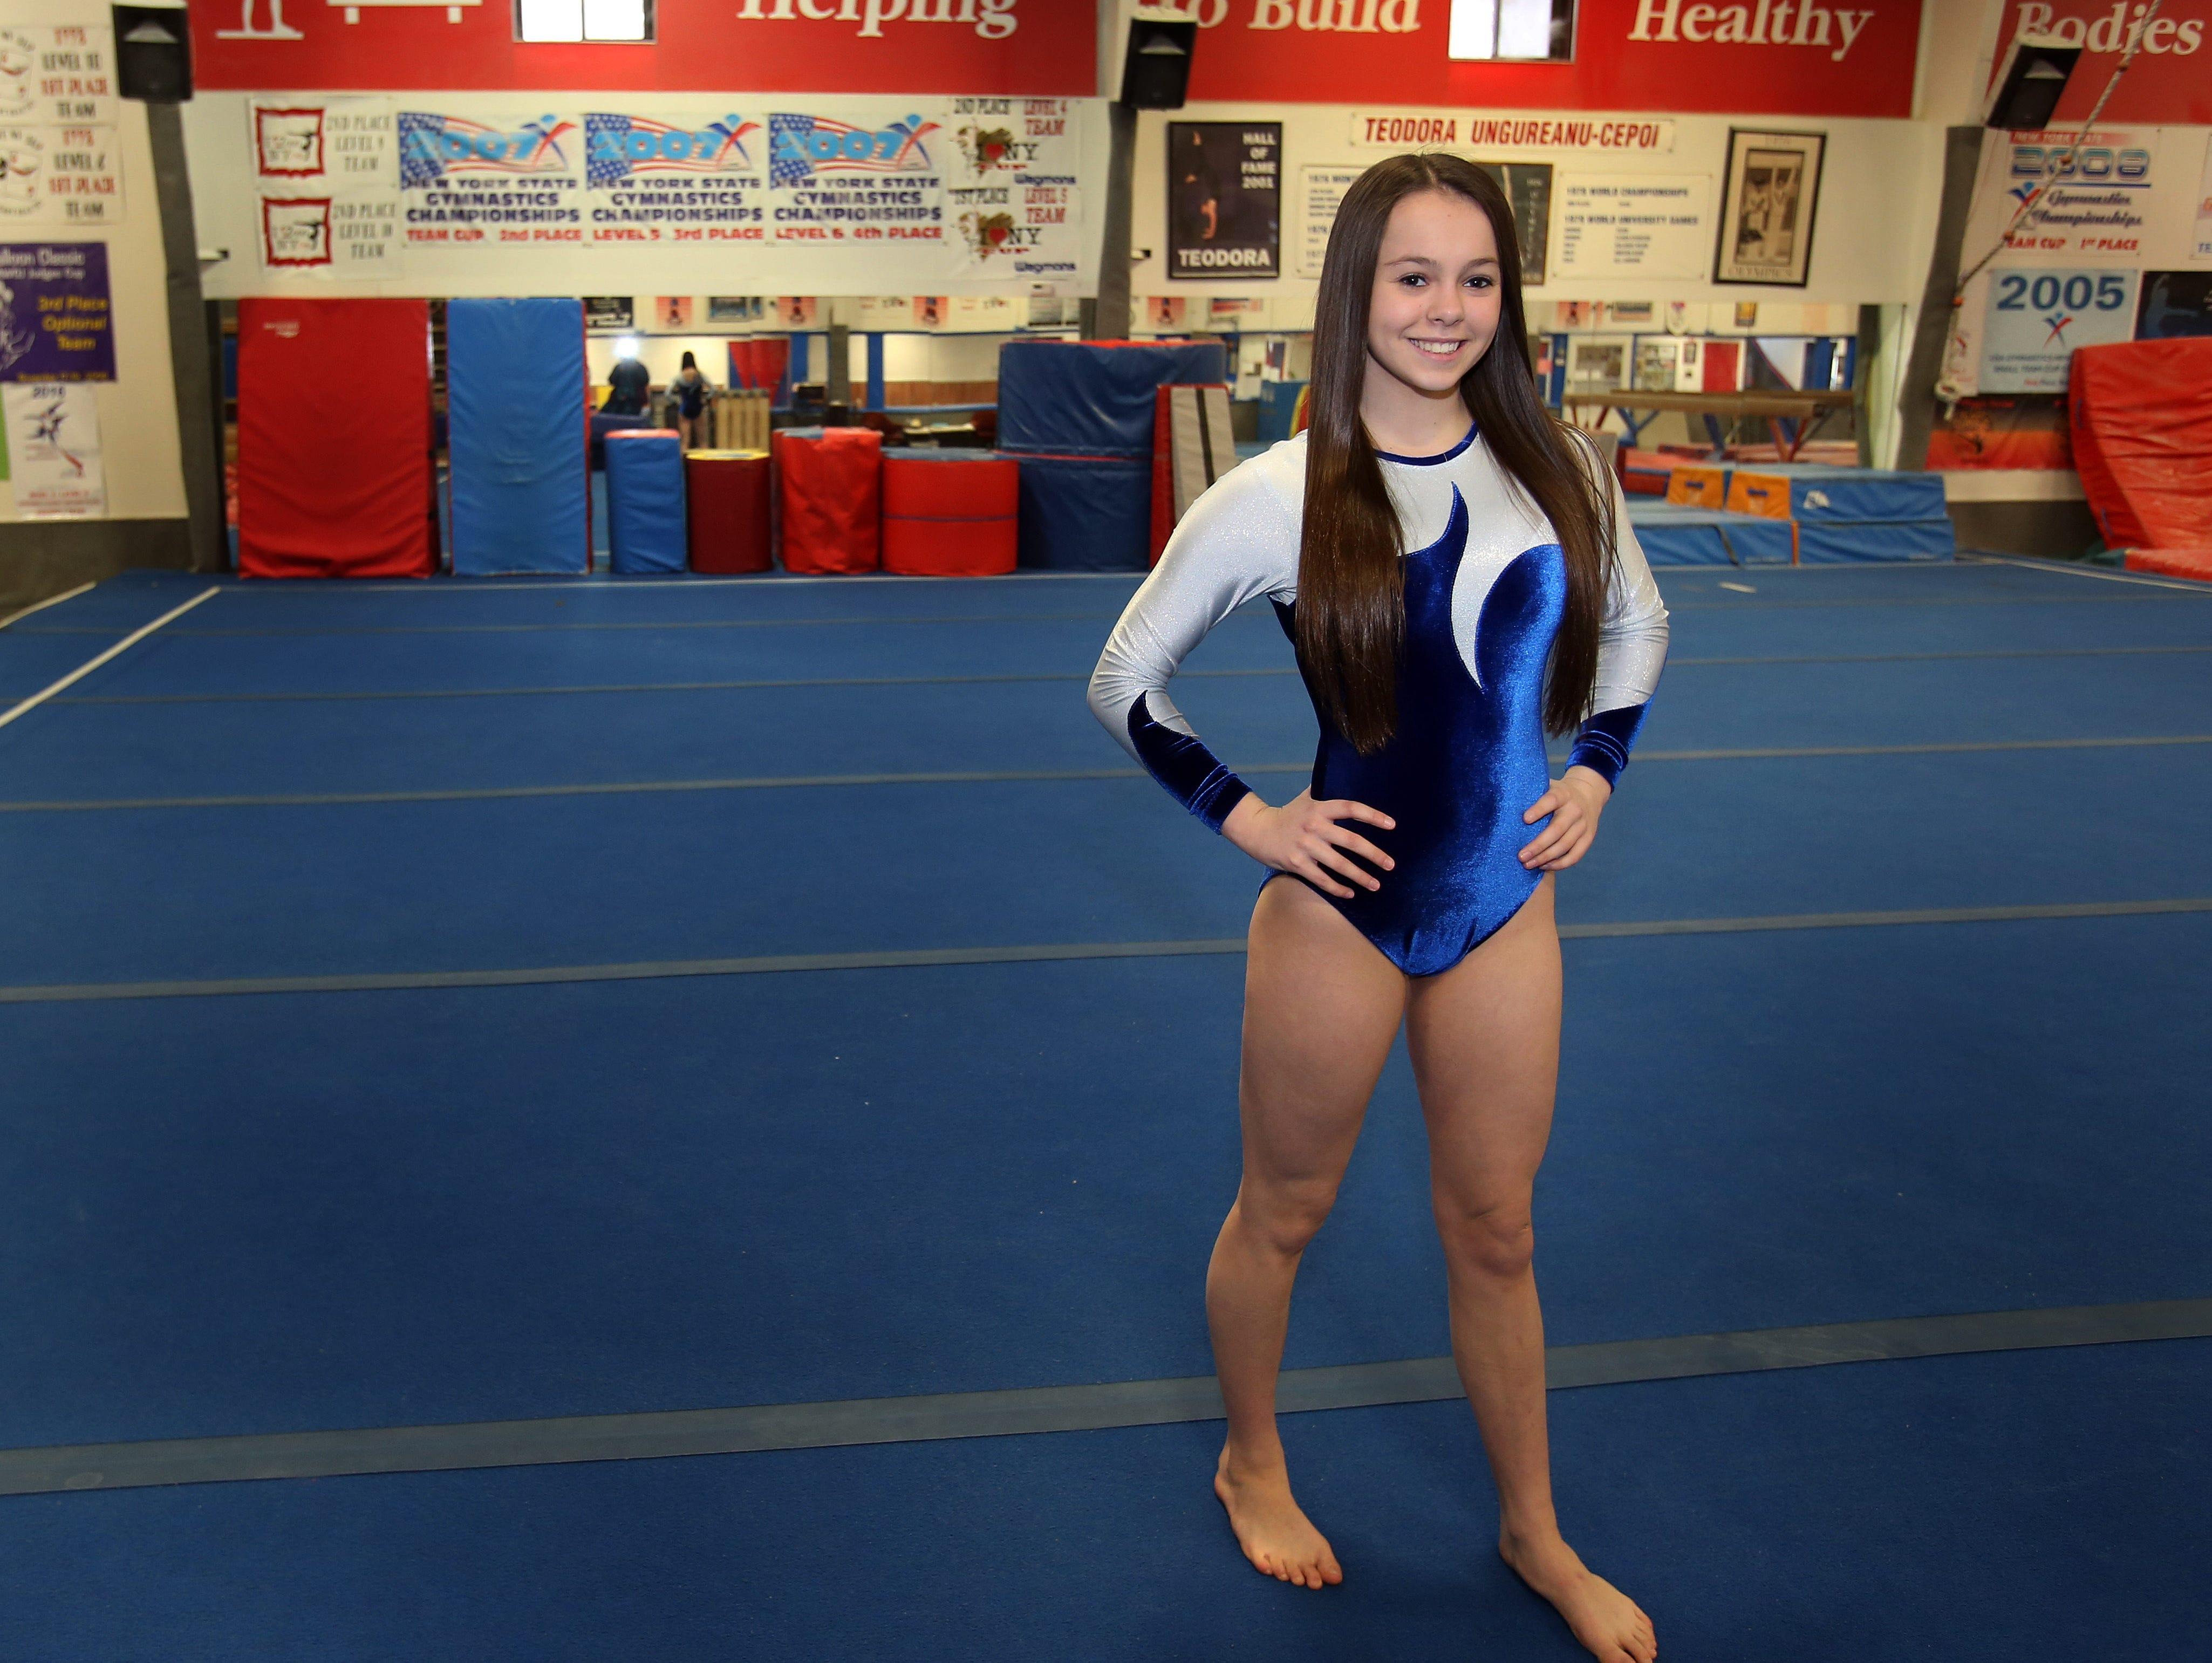 Mahopac junior Callie Johanson is the Journal News/lohud co-gymnast of the year with teammate Katherine Dorovitsine.